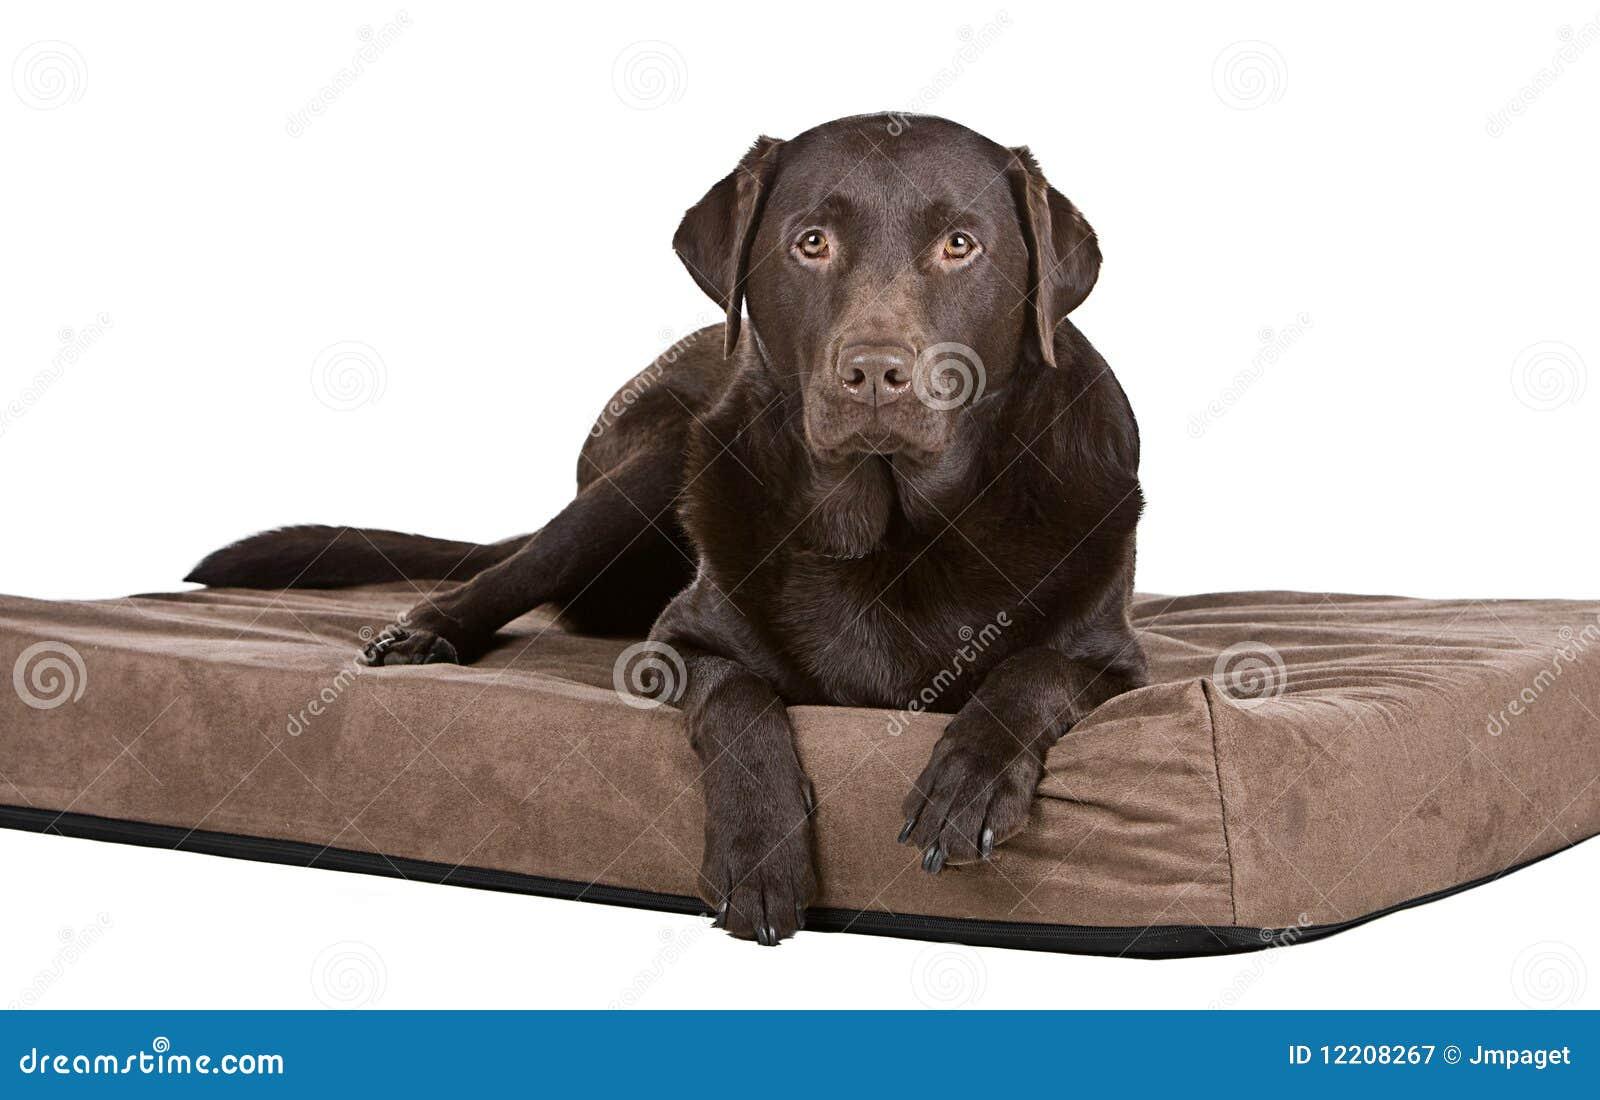 Knappe Chocolade Labrador op Bed. Op z n gemak!